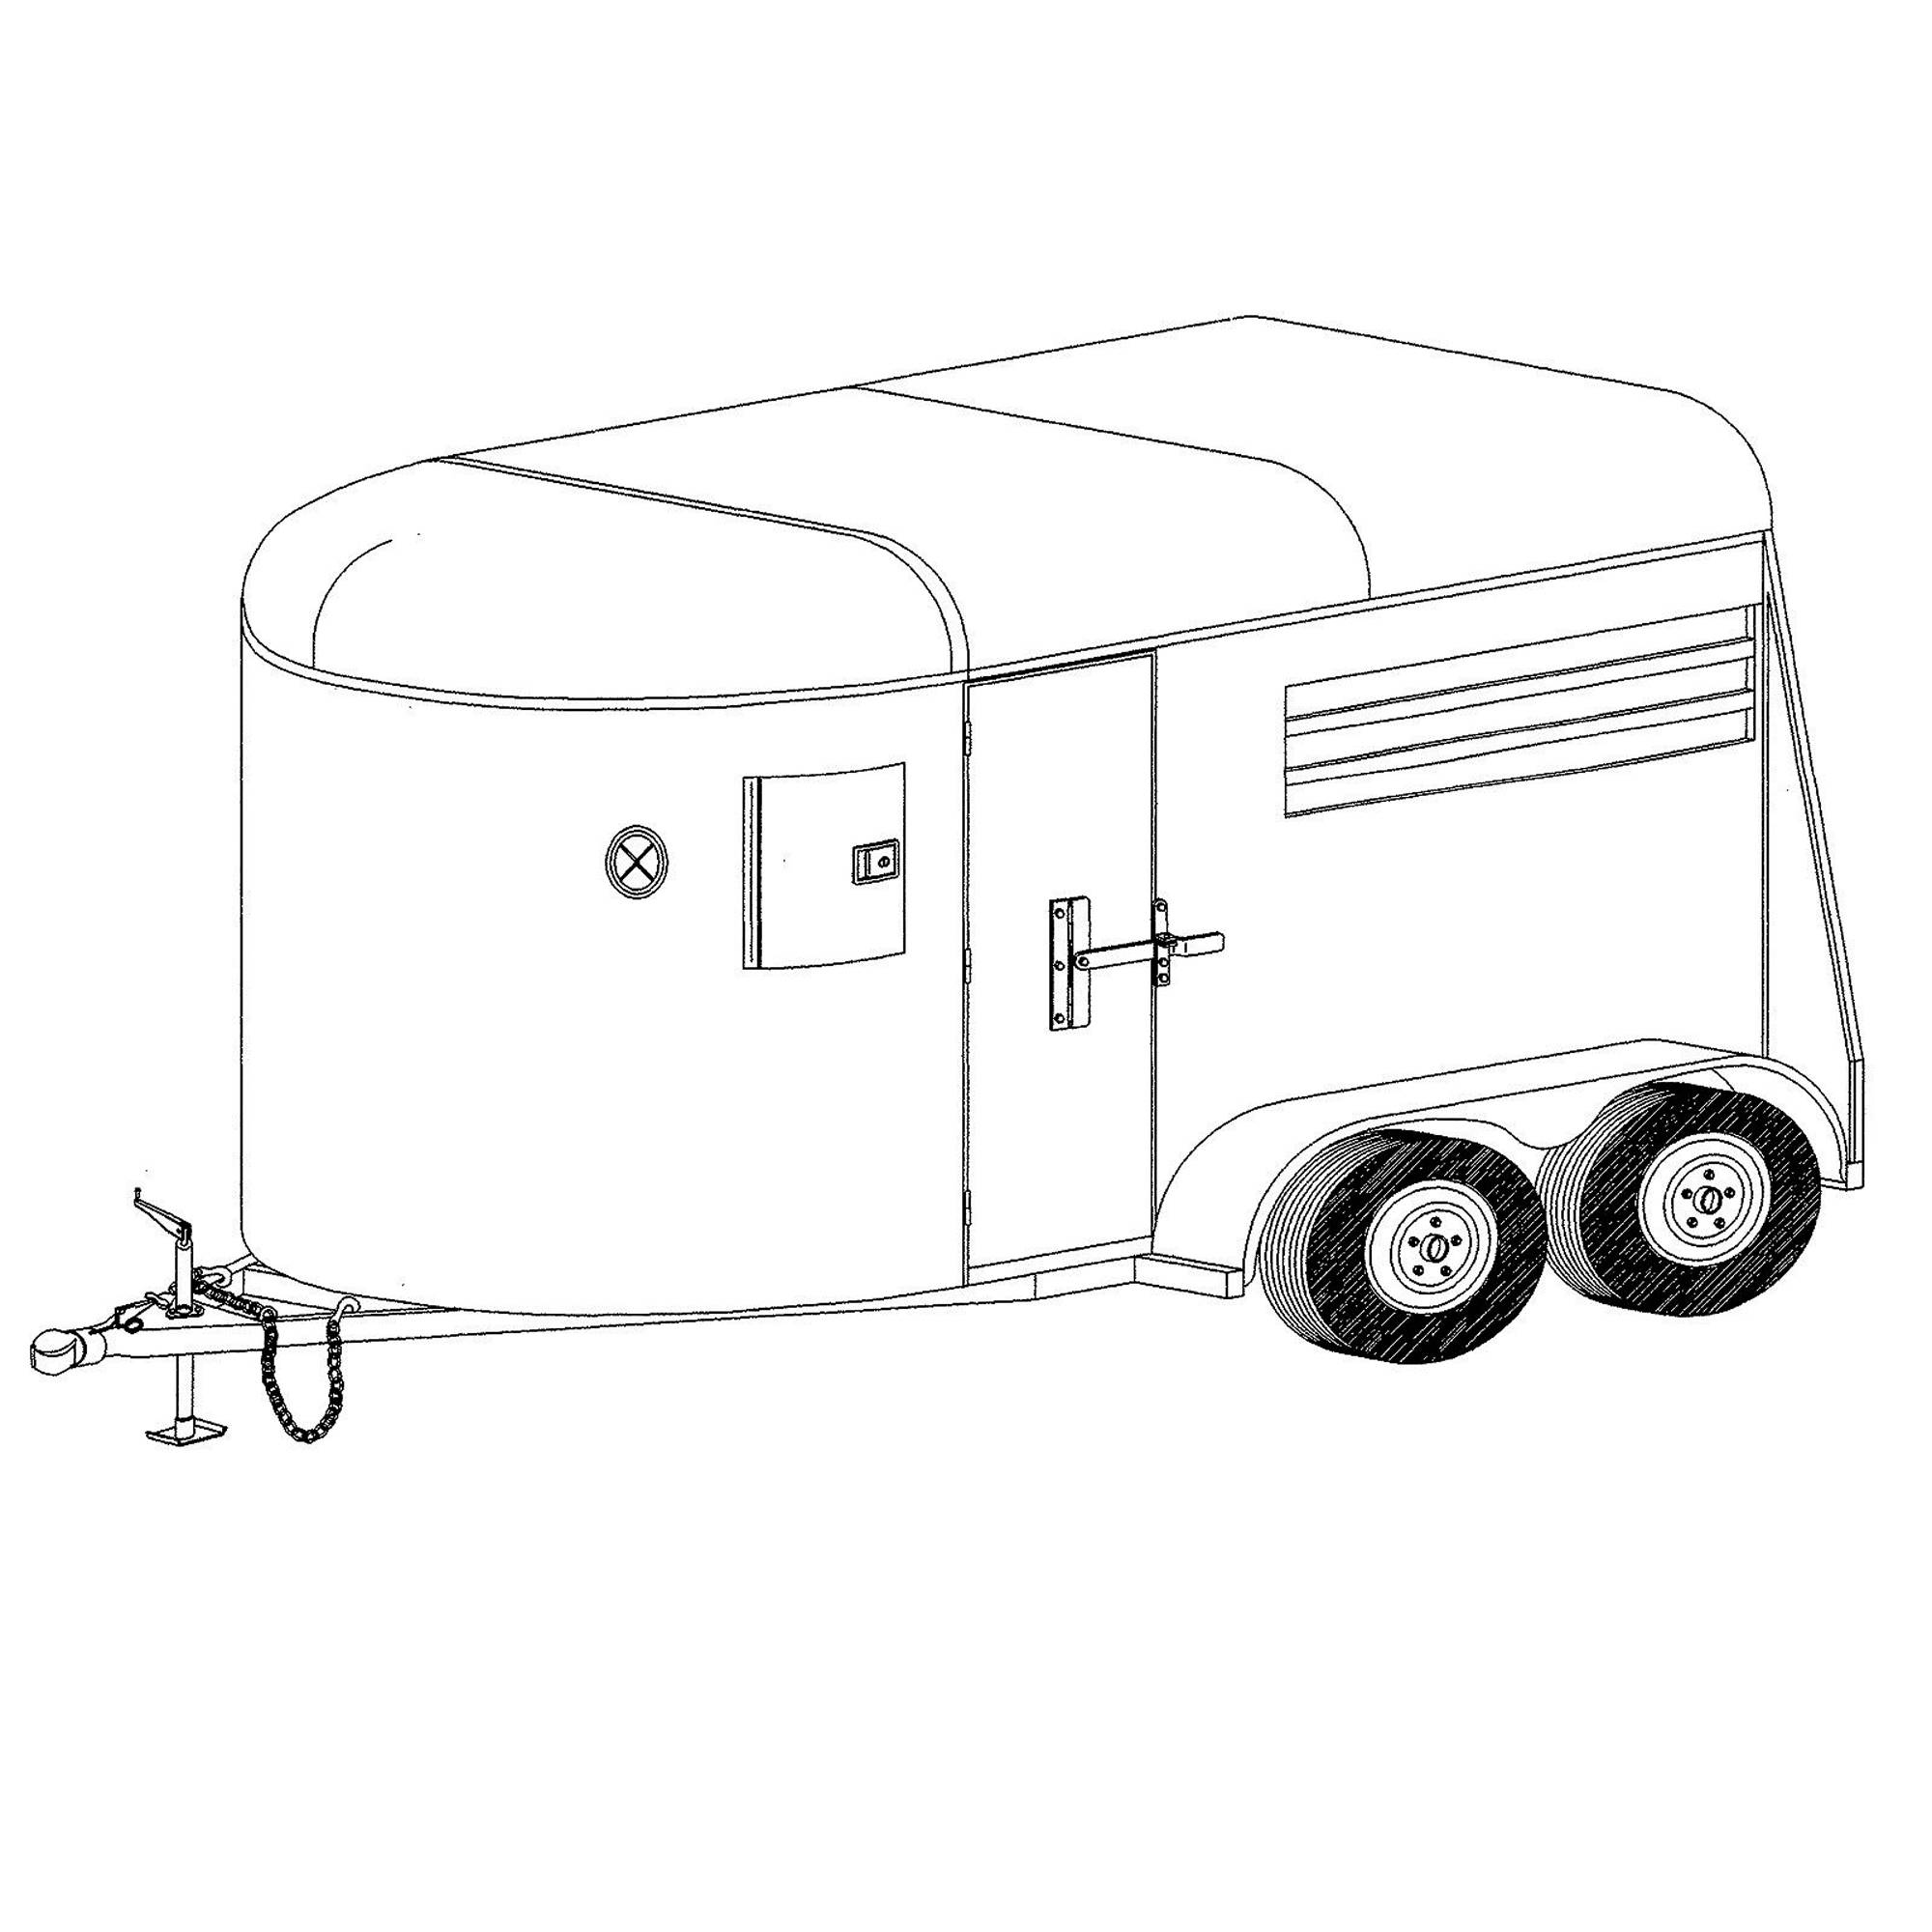 Jeep Rocker Arm Diagram Imageresizertool